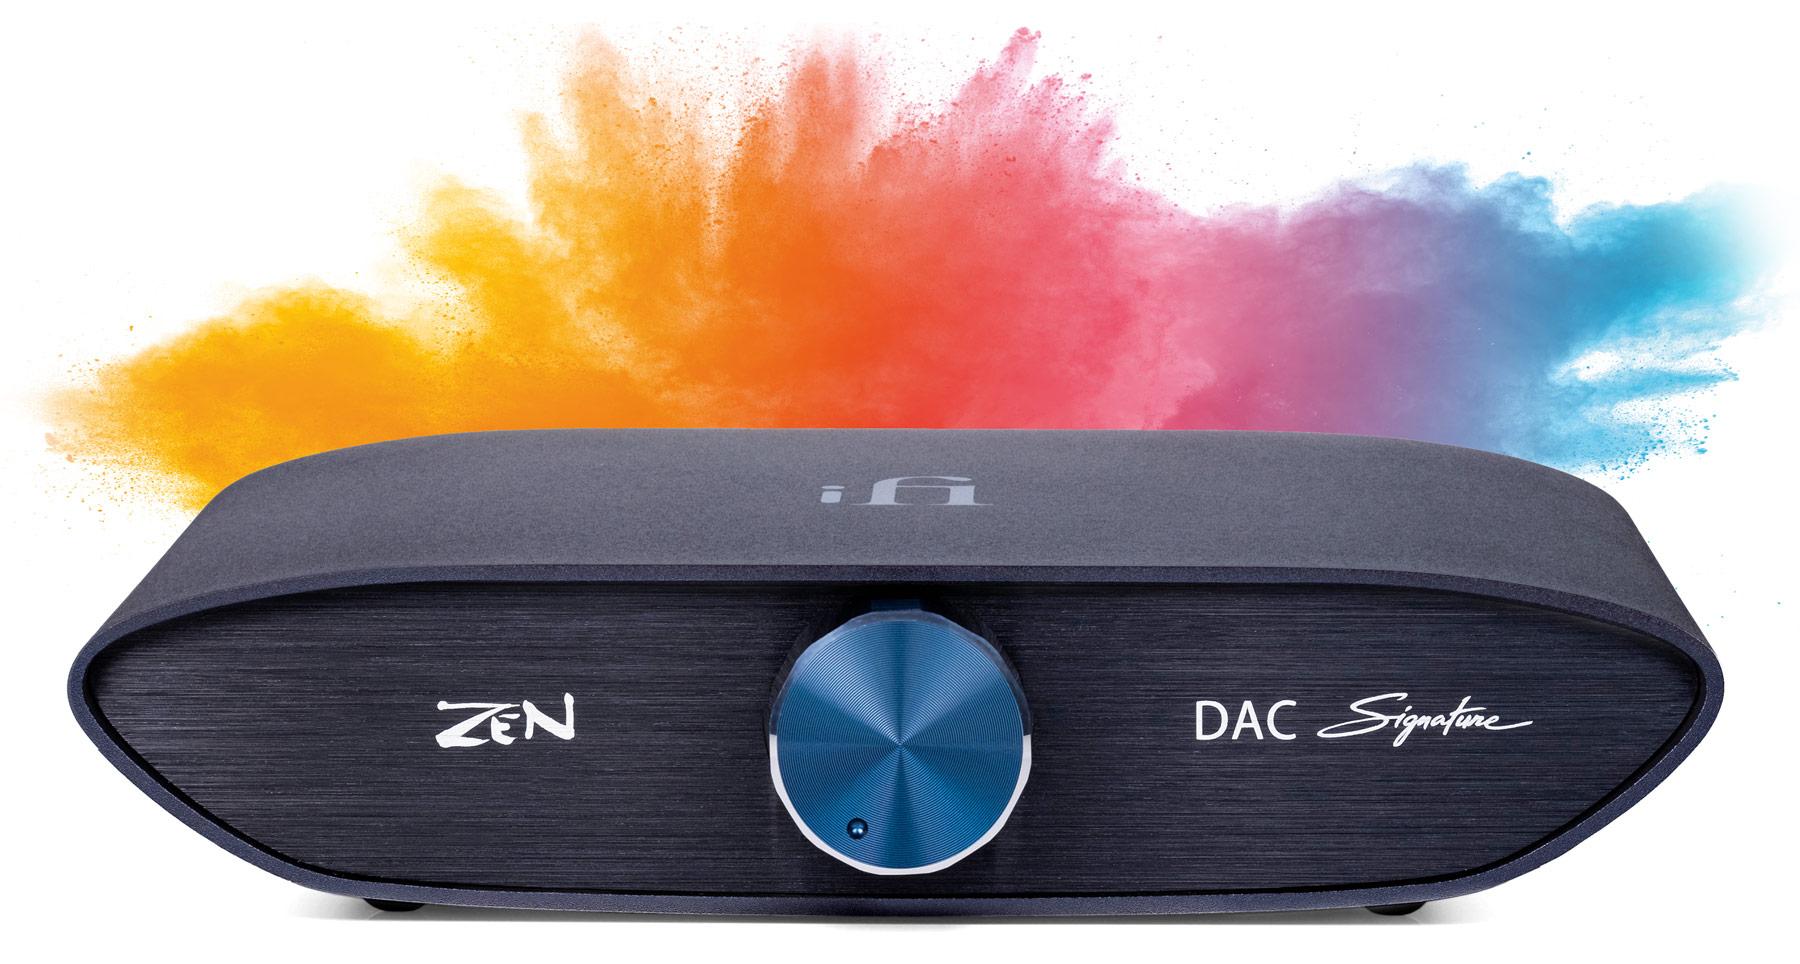 ZEN DAC Signature from iFi audio